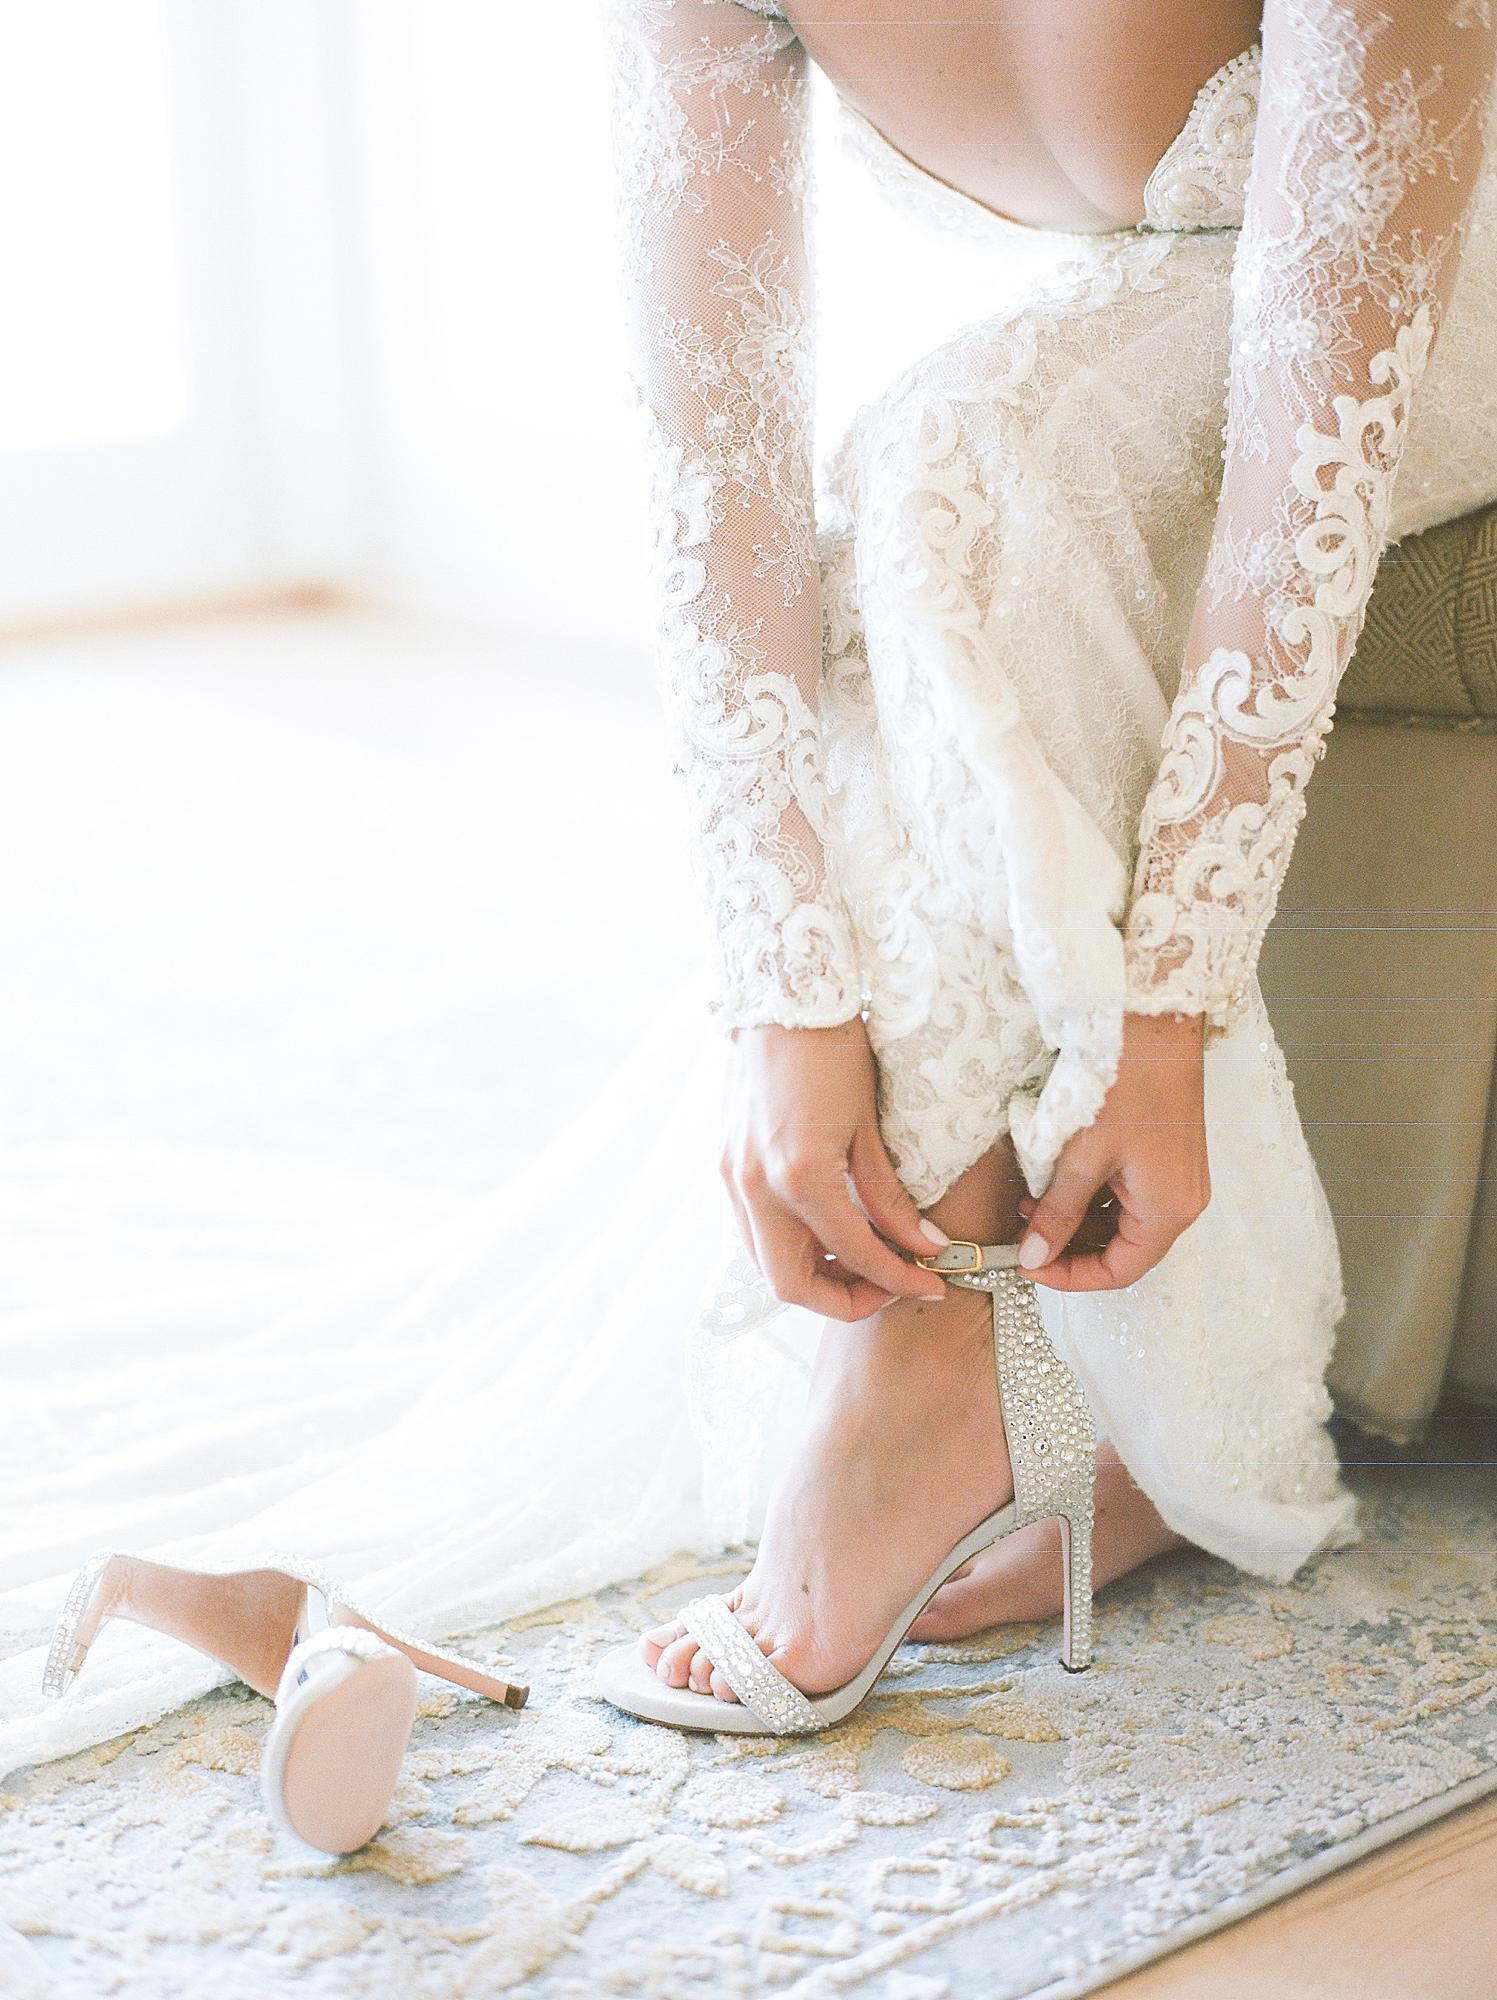 Bonnet Island Estate Film Wedding Photography by Magdalena Studios 0017